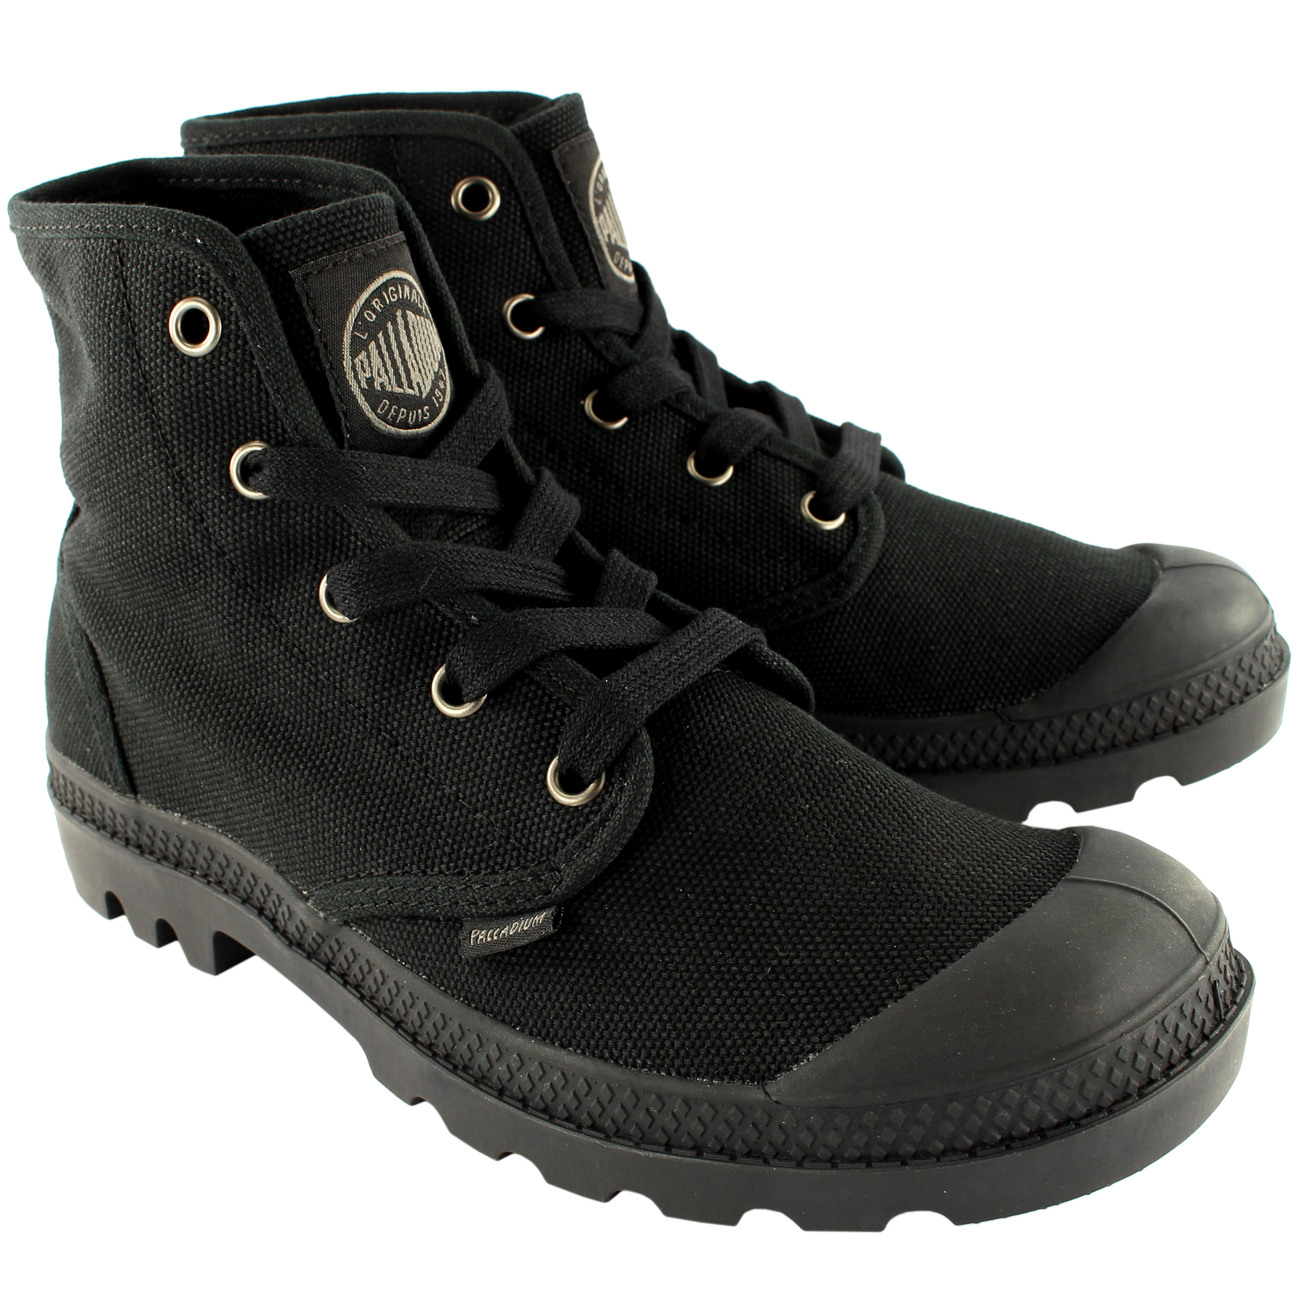 Palladium Pama Trainer Boots